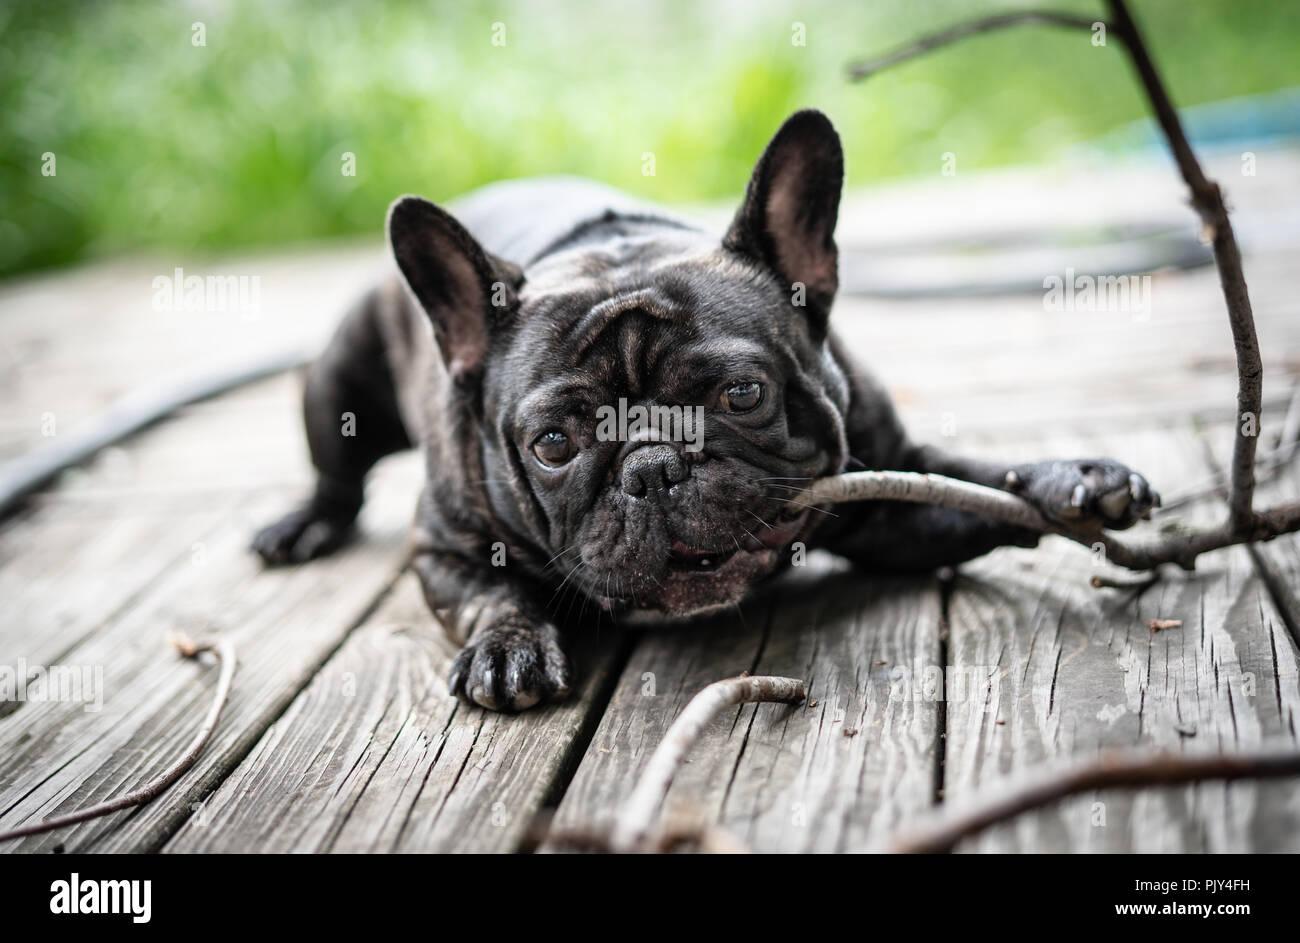 French bulldog portrait - Stock Image